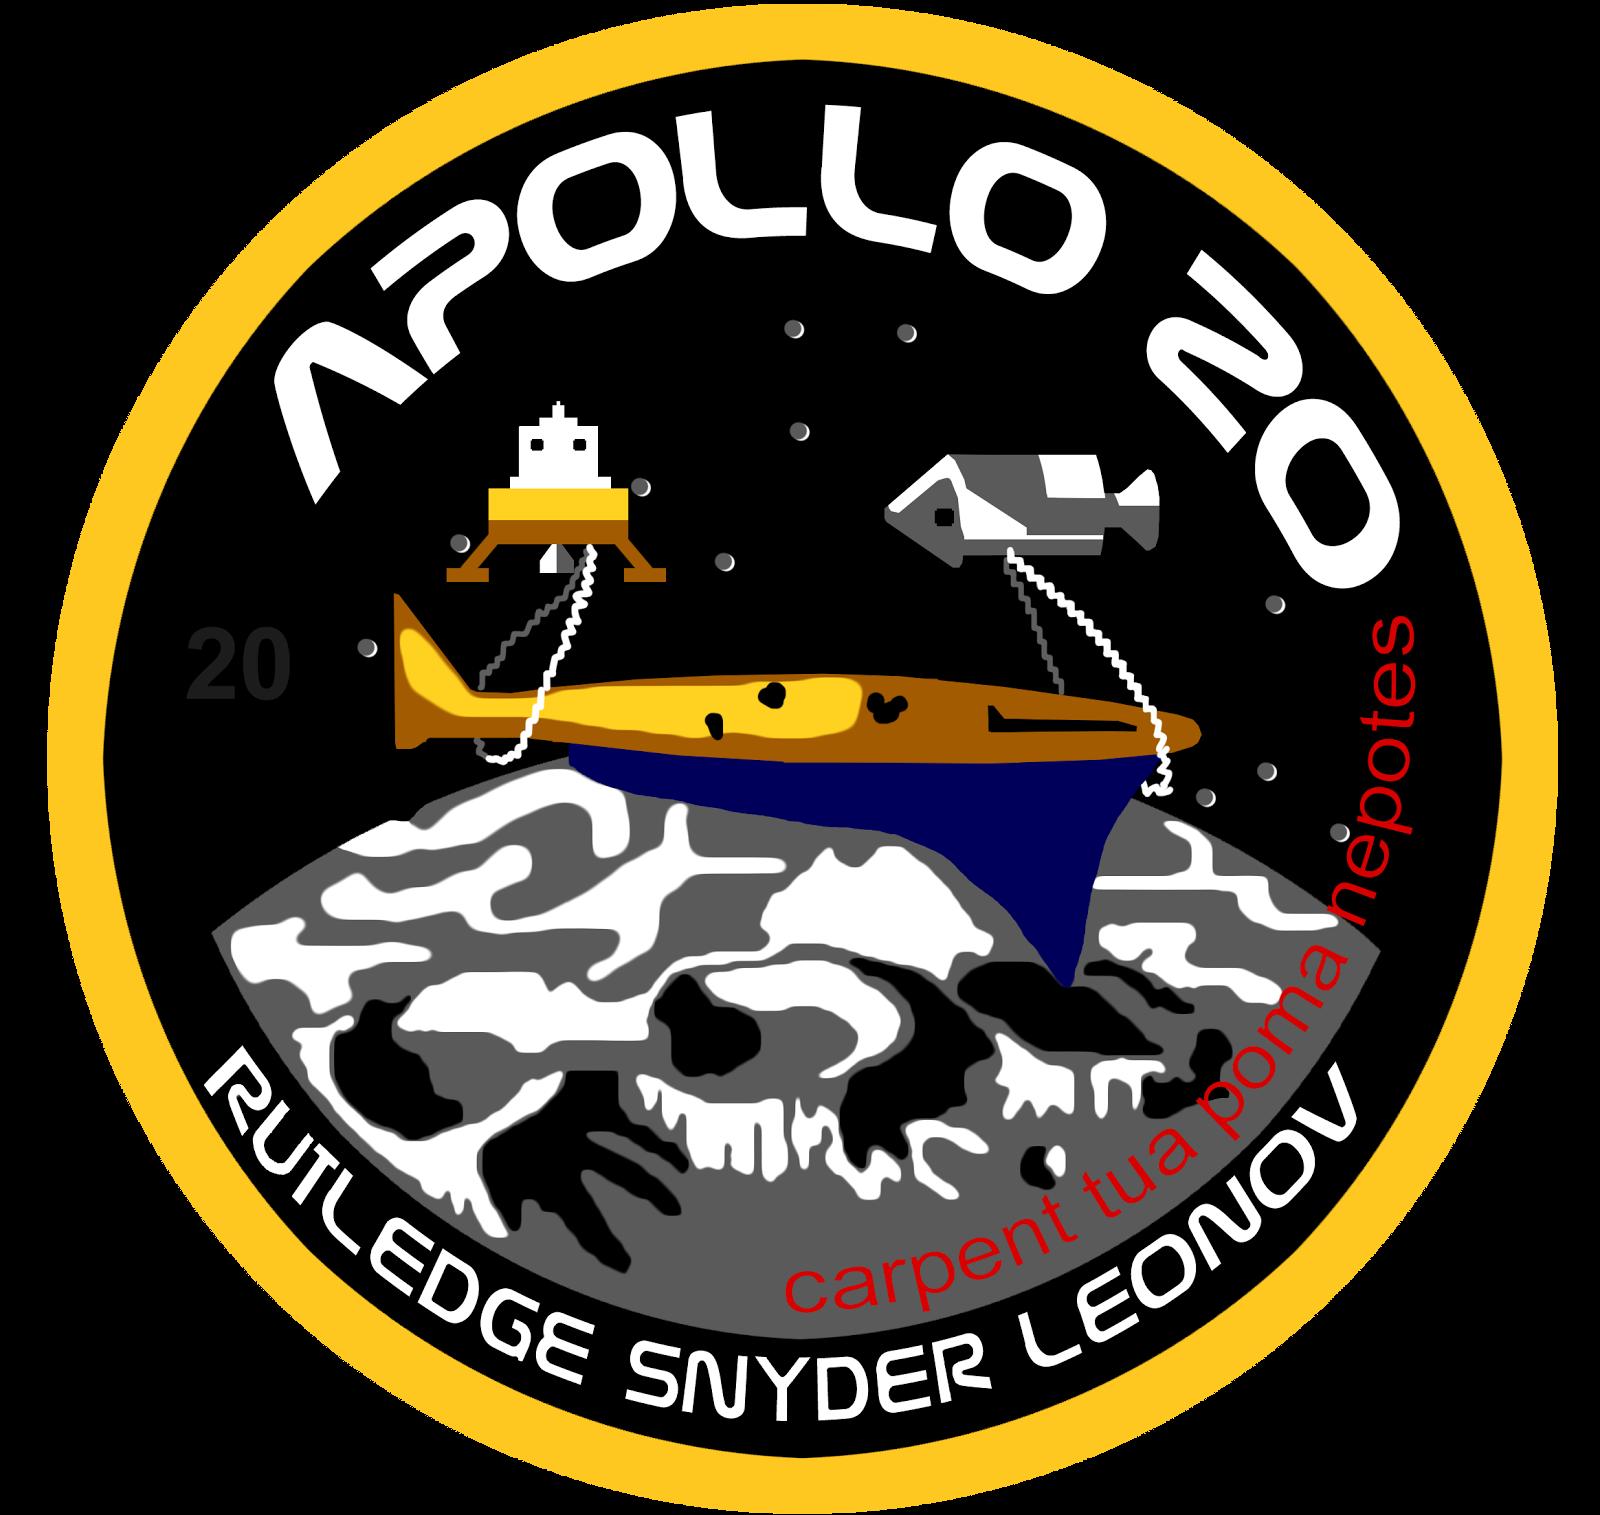 COG - NASA: Apollo 20 PSYOP (Recovering Alien Technology ...